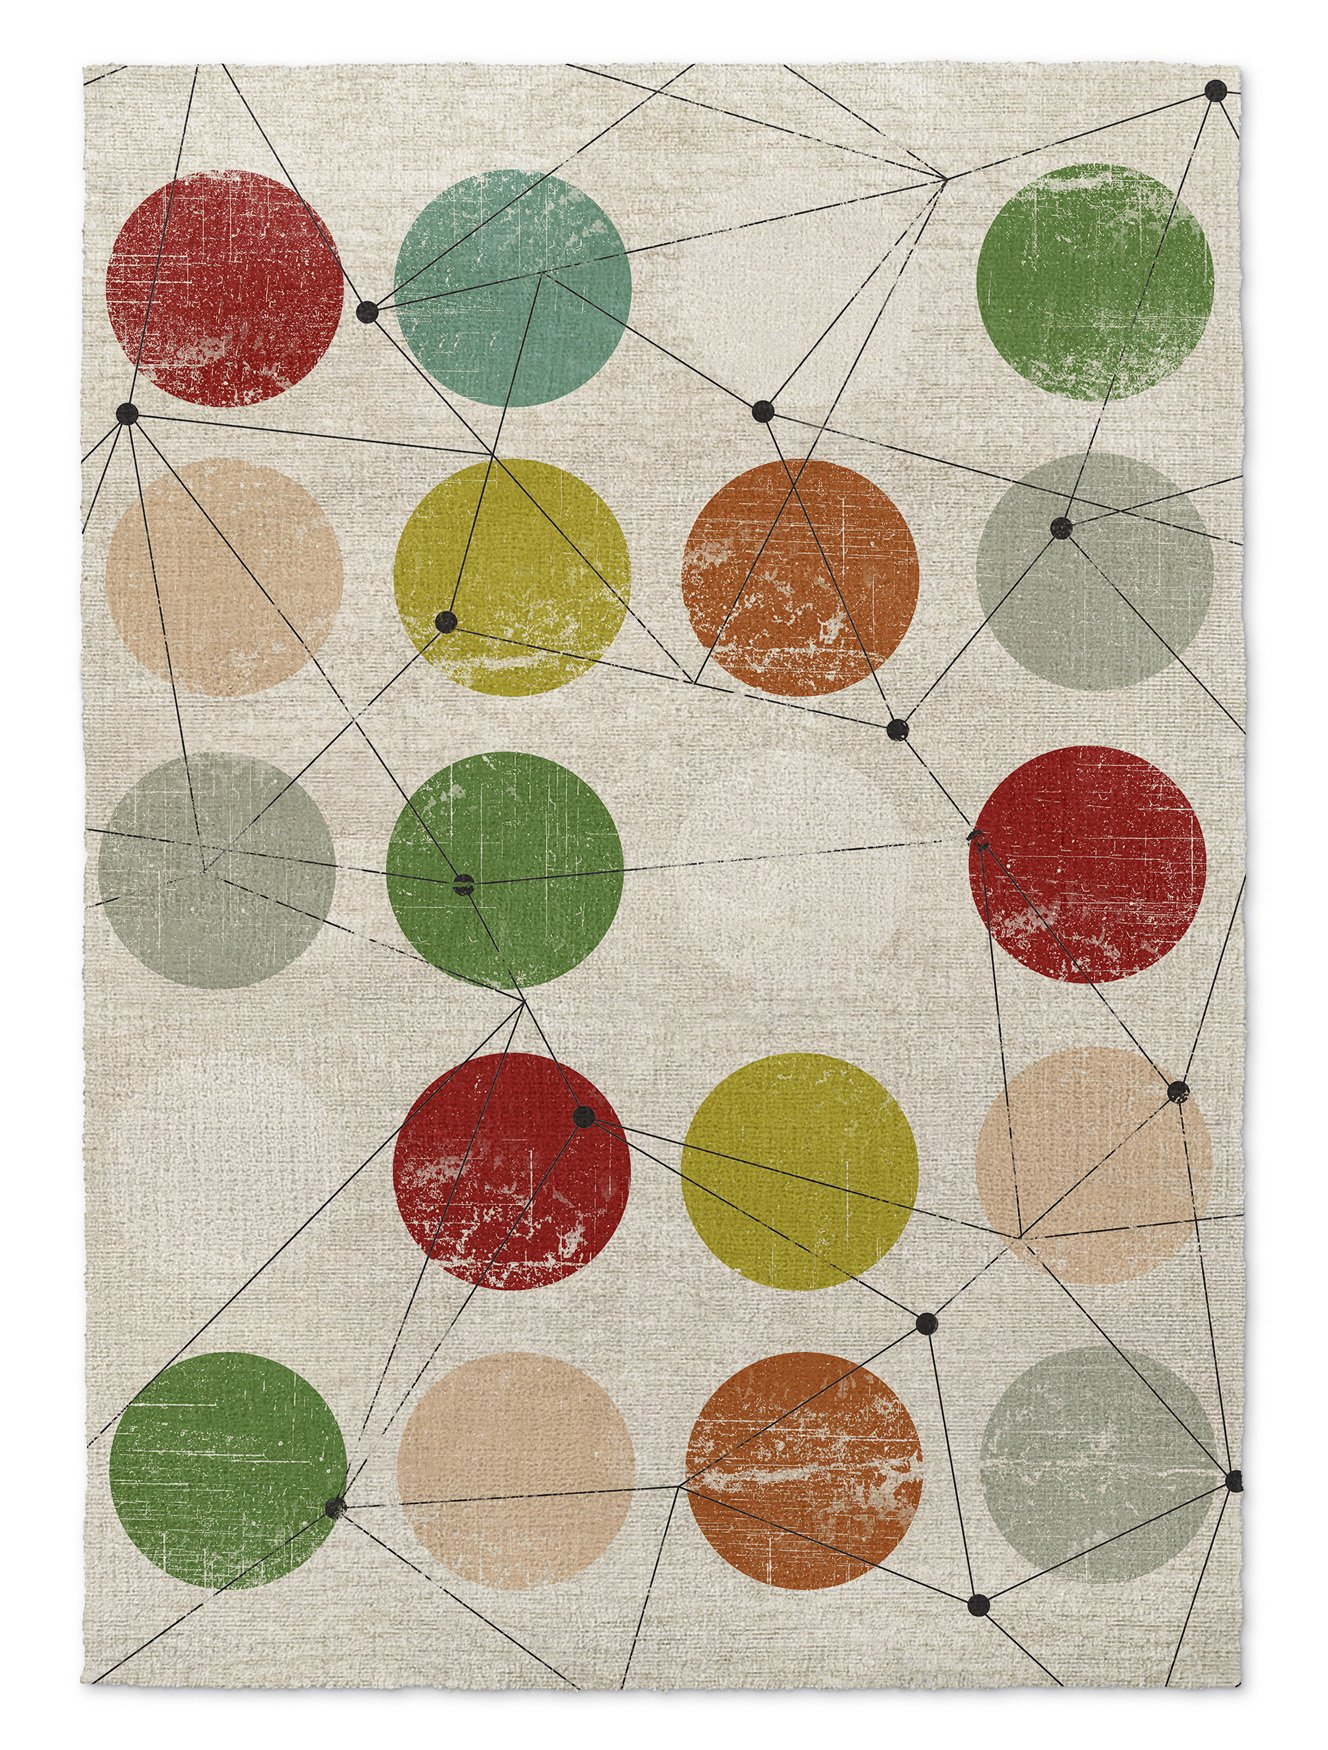 KAVKA Designs Nova Area Rug, (Red/Green/Orange/Blue/Brown) - MOD Collection, Size: 8x10x.5 - (TELAVC8225RUG810)